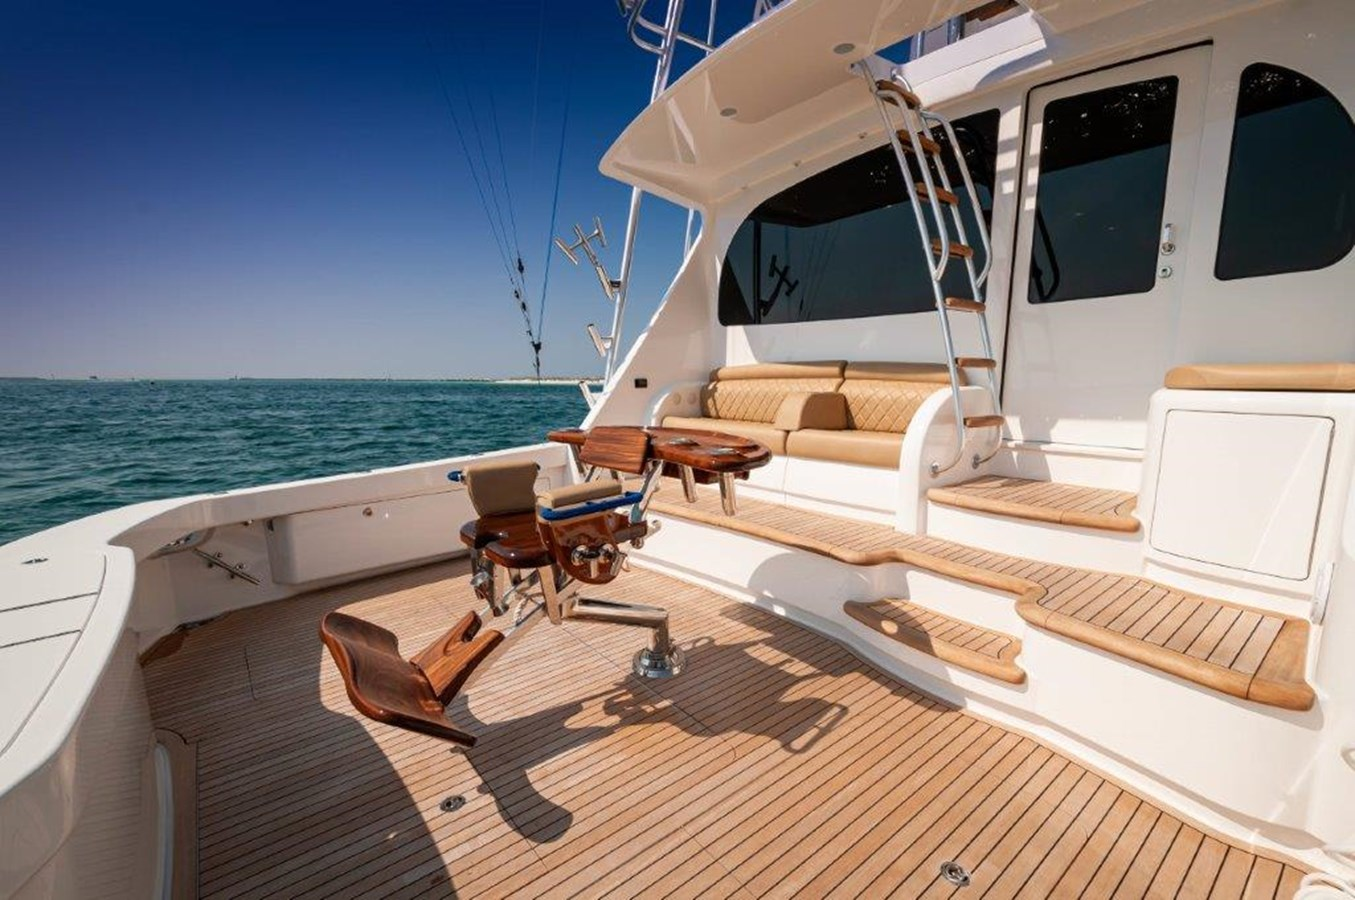 2019 68 Viking Convertible - Cockpit-4 2019 VIKING 68 Convertible Sport Fisherman 2560095